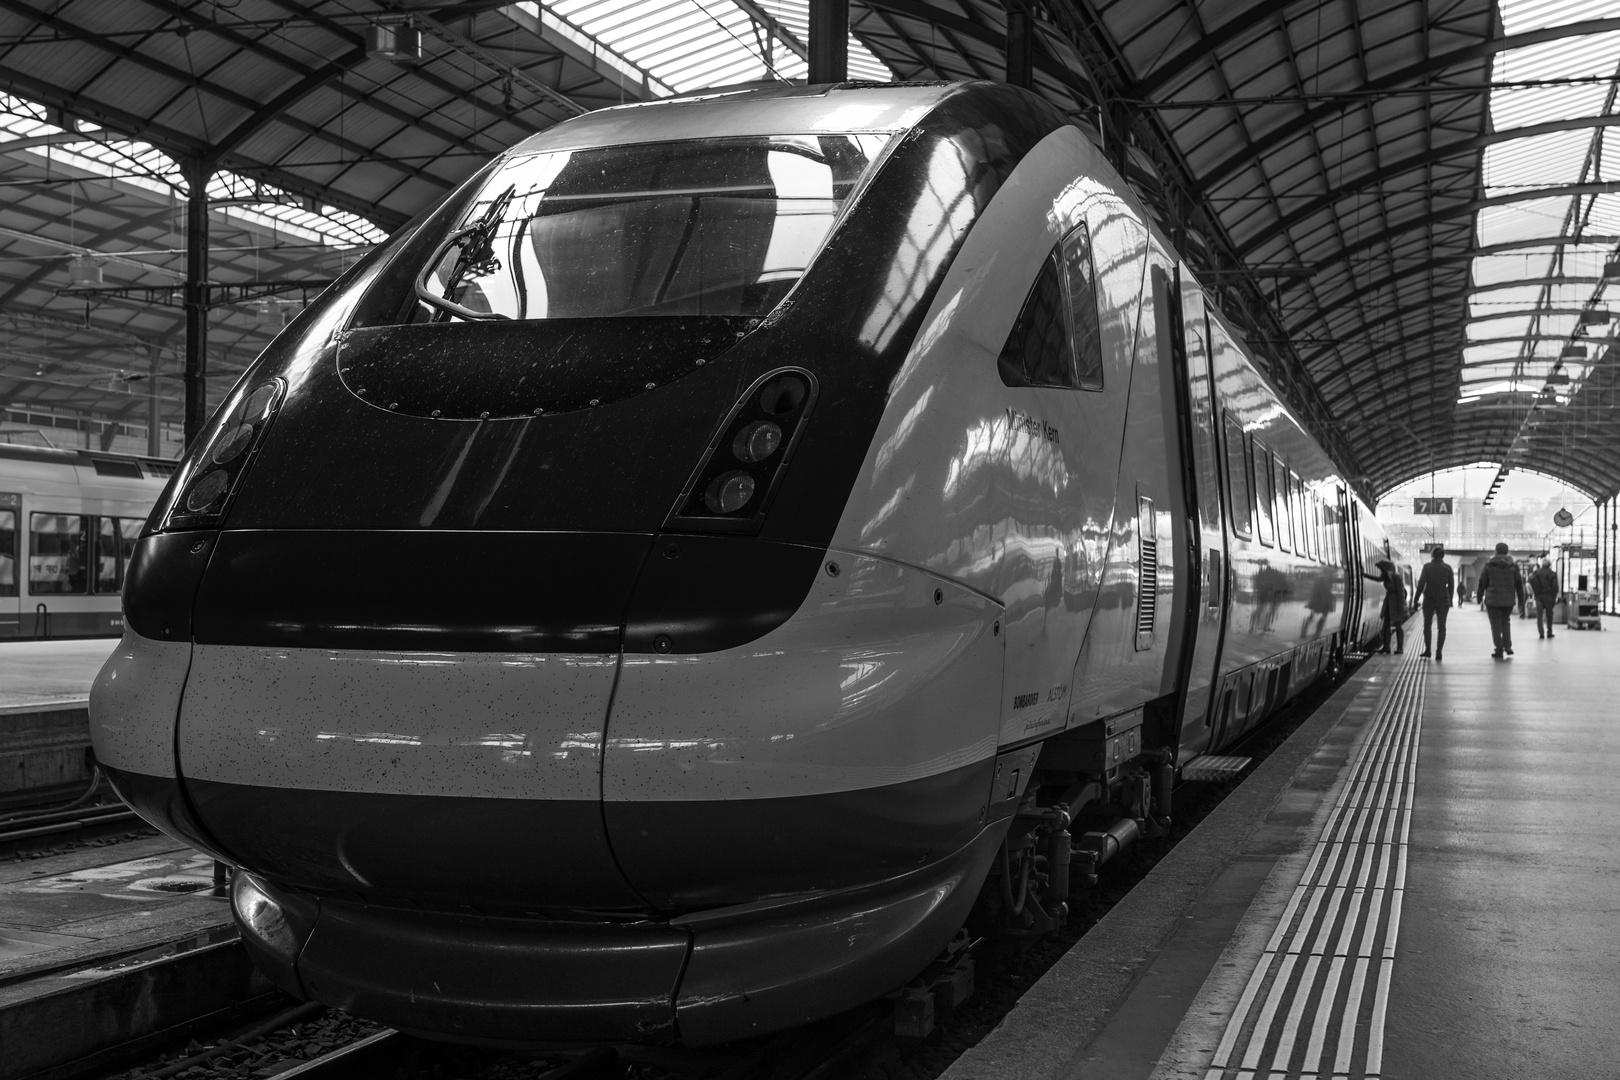 Der Intercity-Express